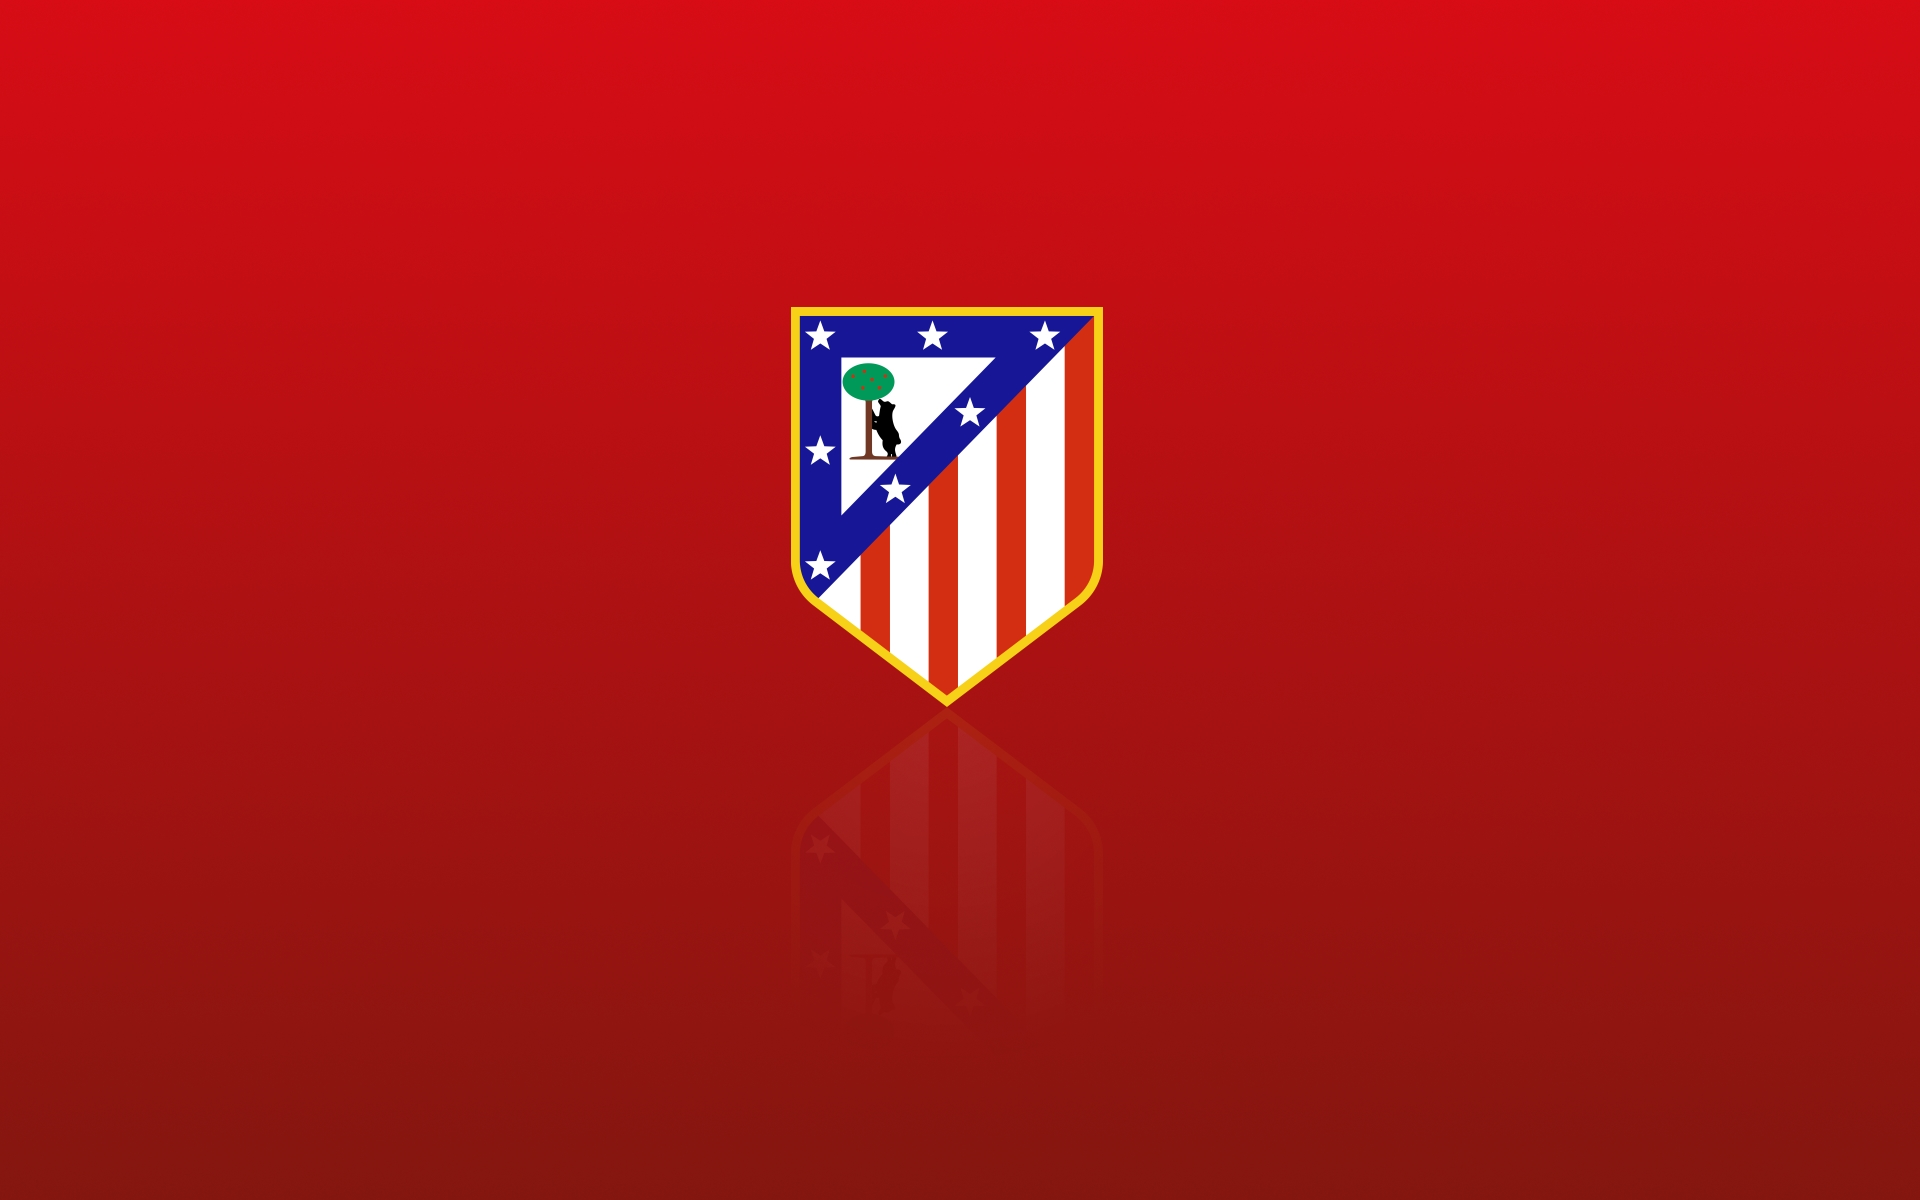 atletico madrid - photo #11